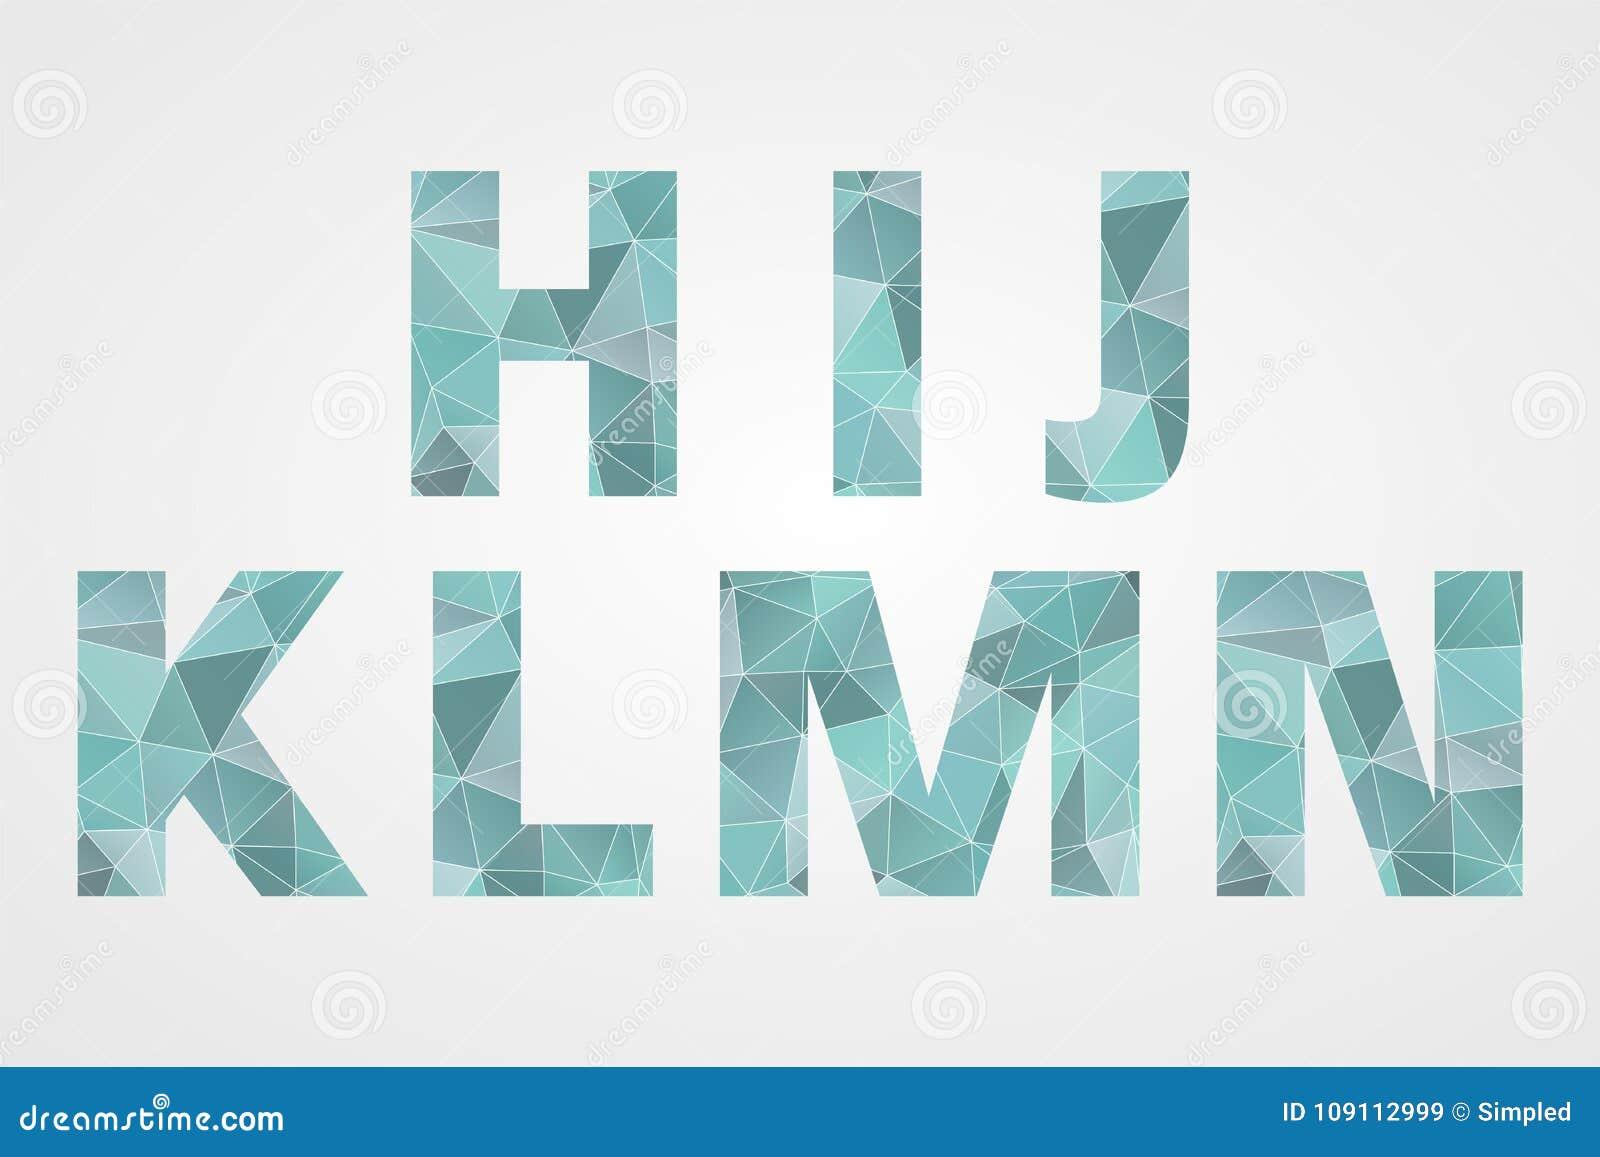 H I J K L M N Polygonal Geometric Letters Abstract Triangle